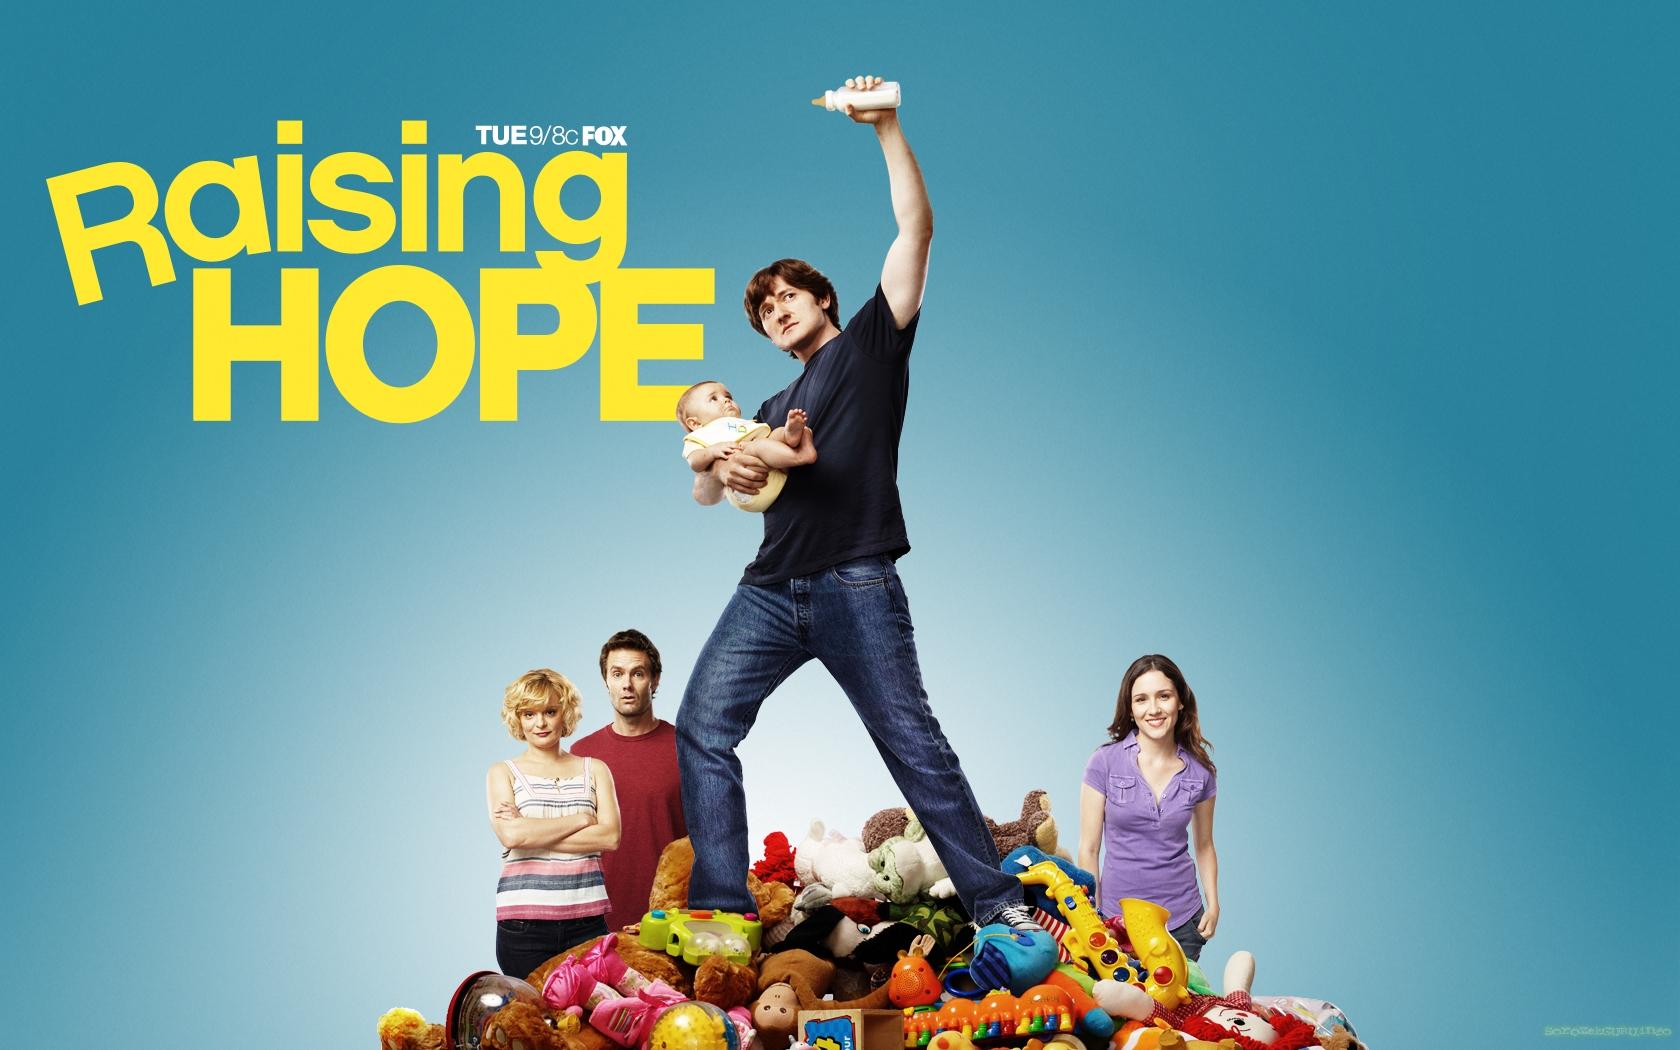 Raising Hope,Fox